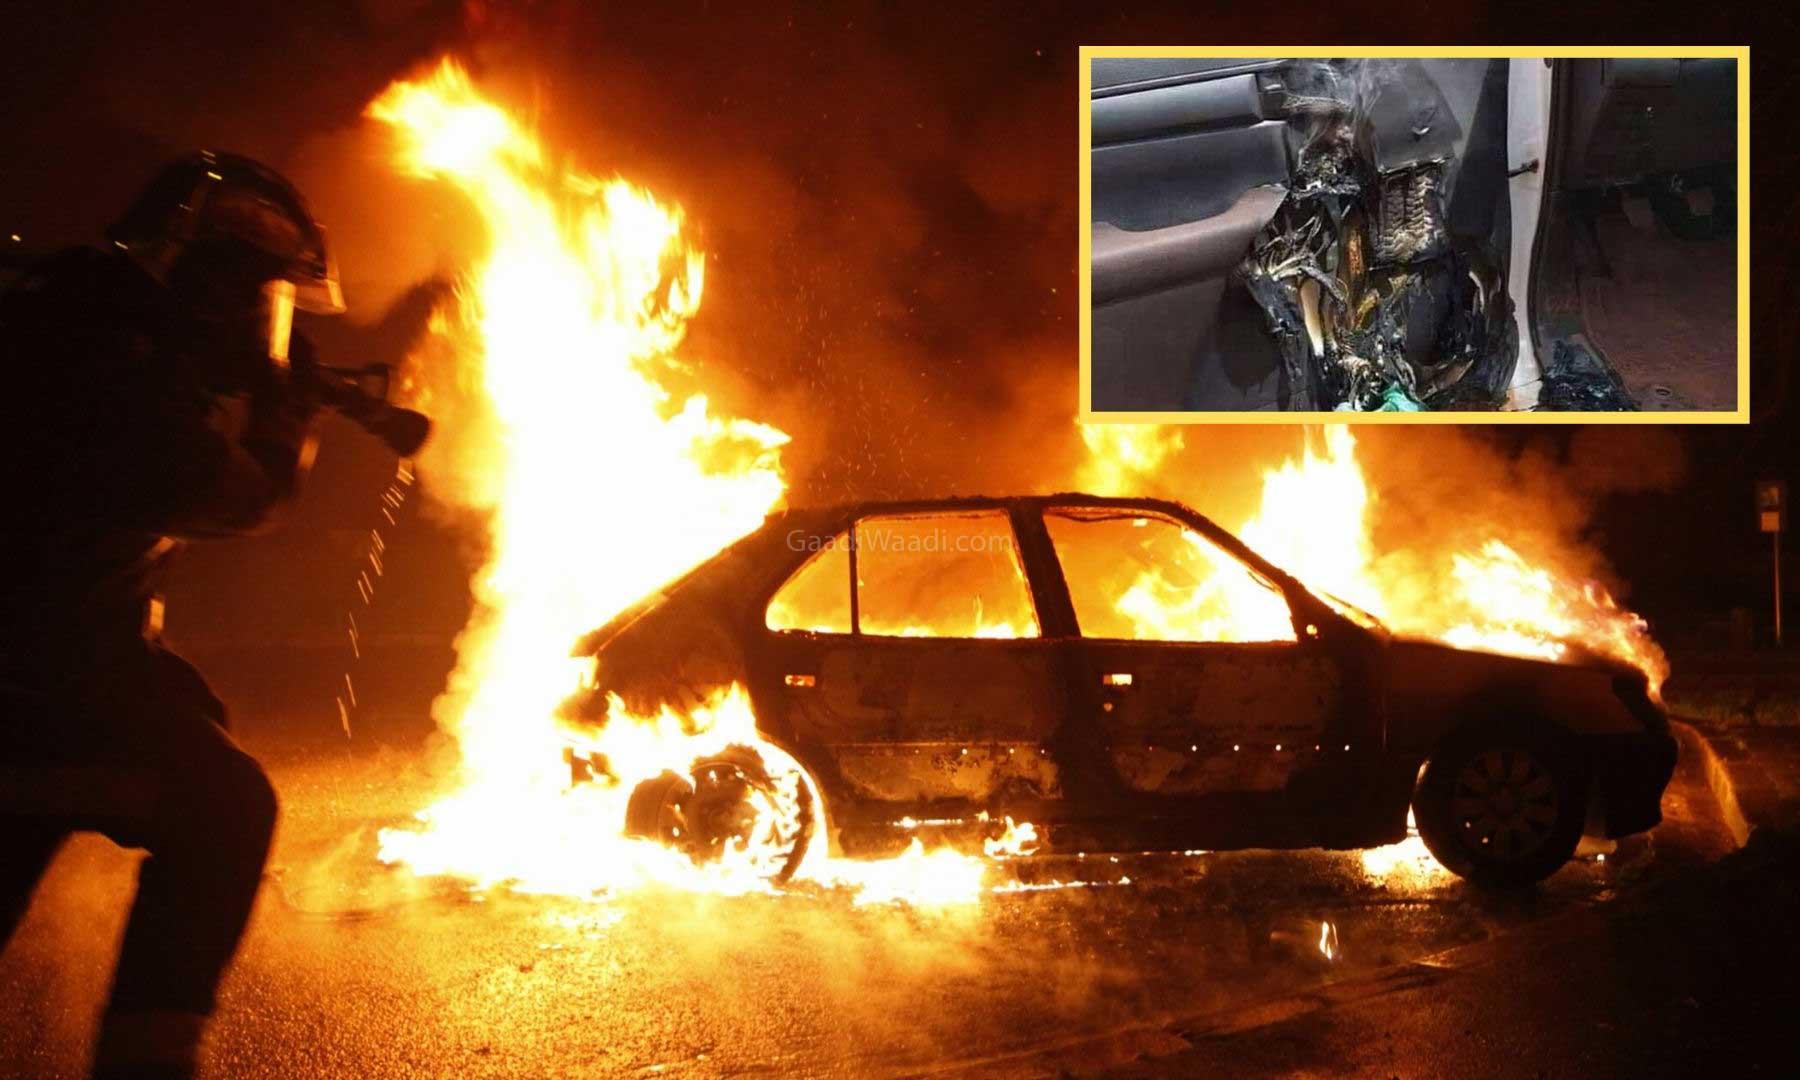 Hand Sanitizers Tend To Explode When Left Inside Hot Car, Warns Fire Dept